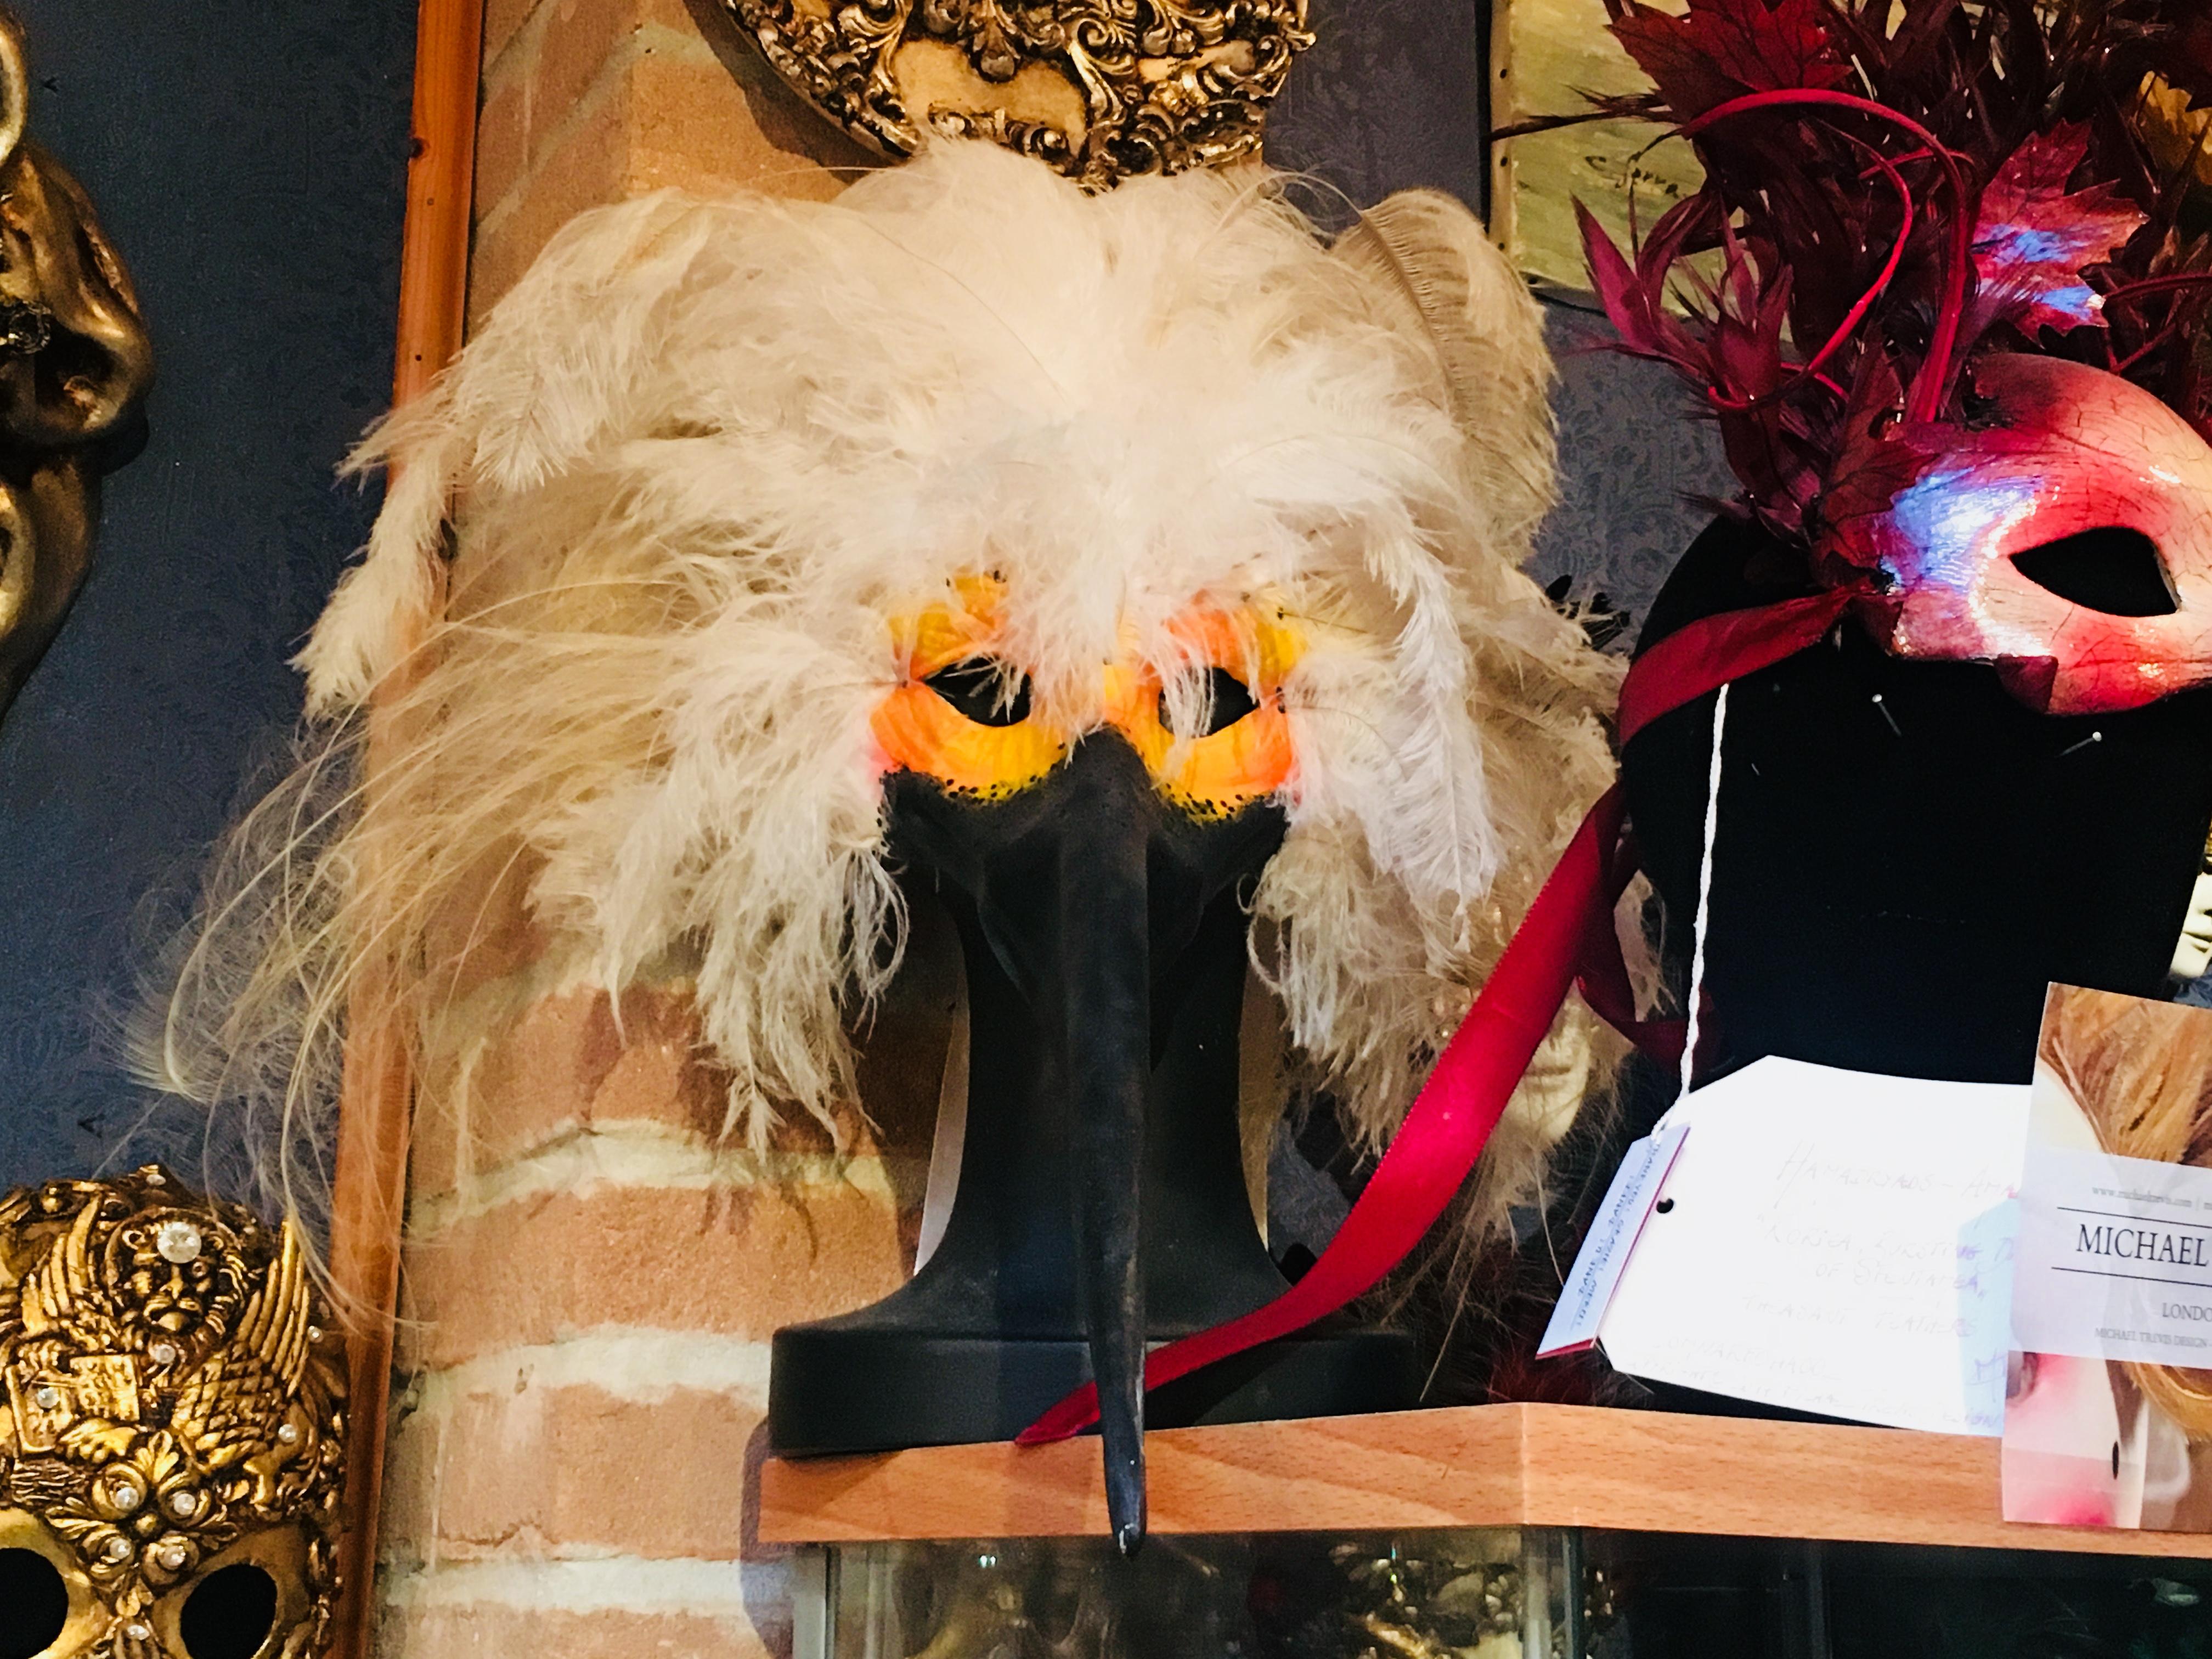 maska wenecka z dlugim nosem i piórami